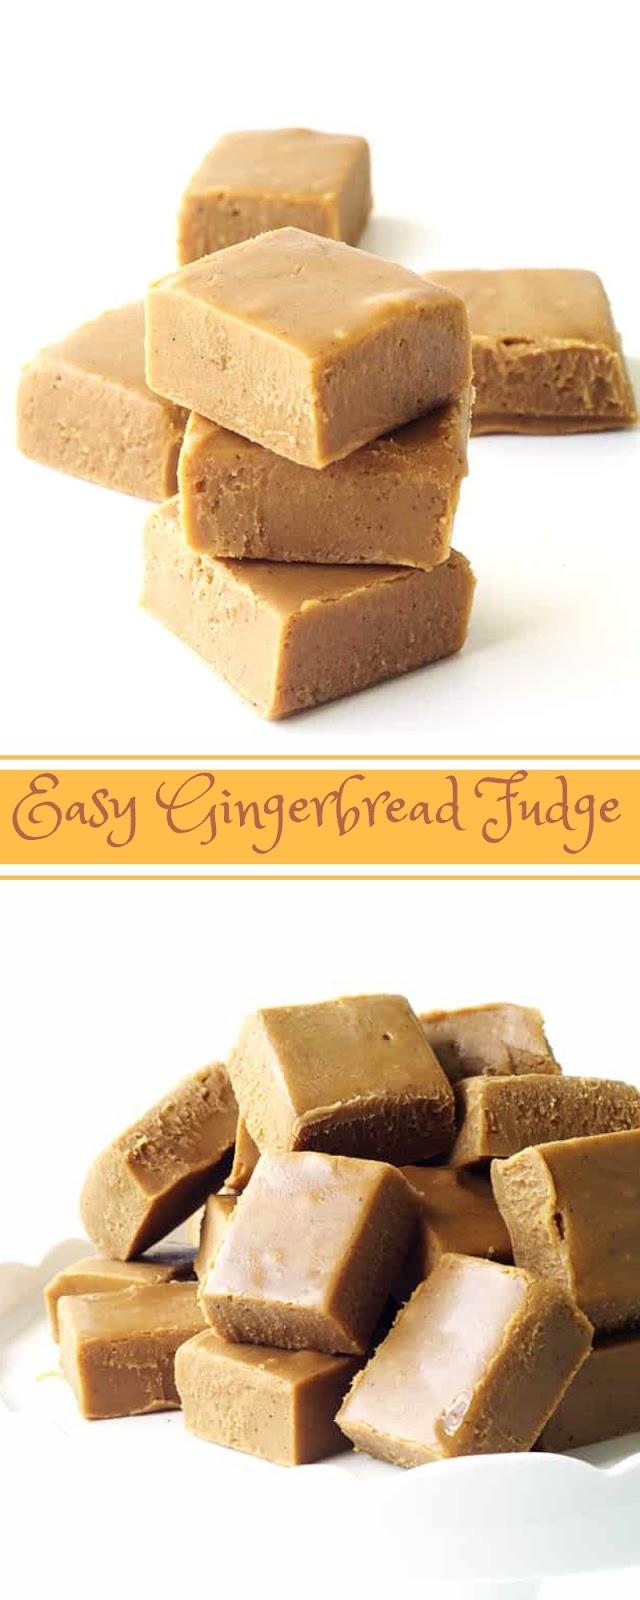 Easy Gingerbread Fudge